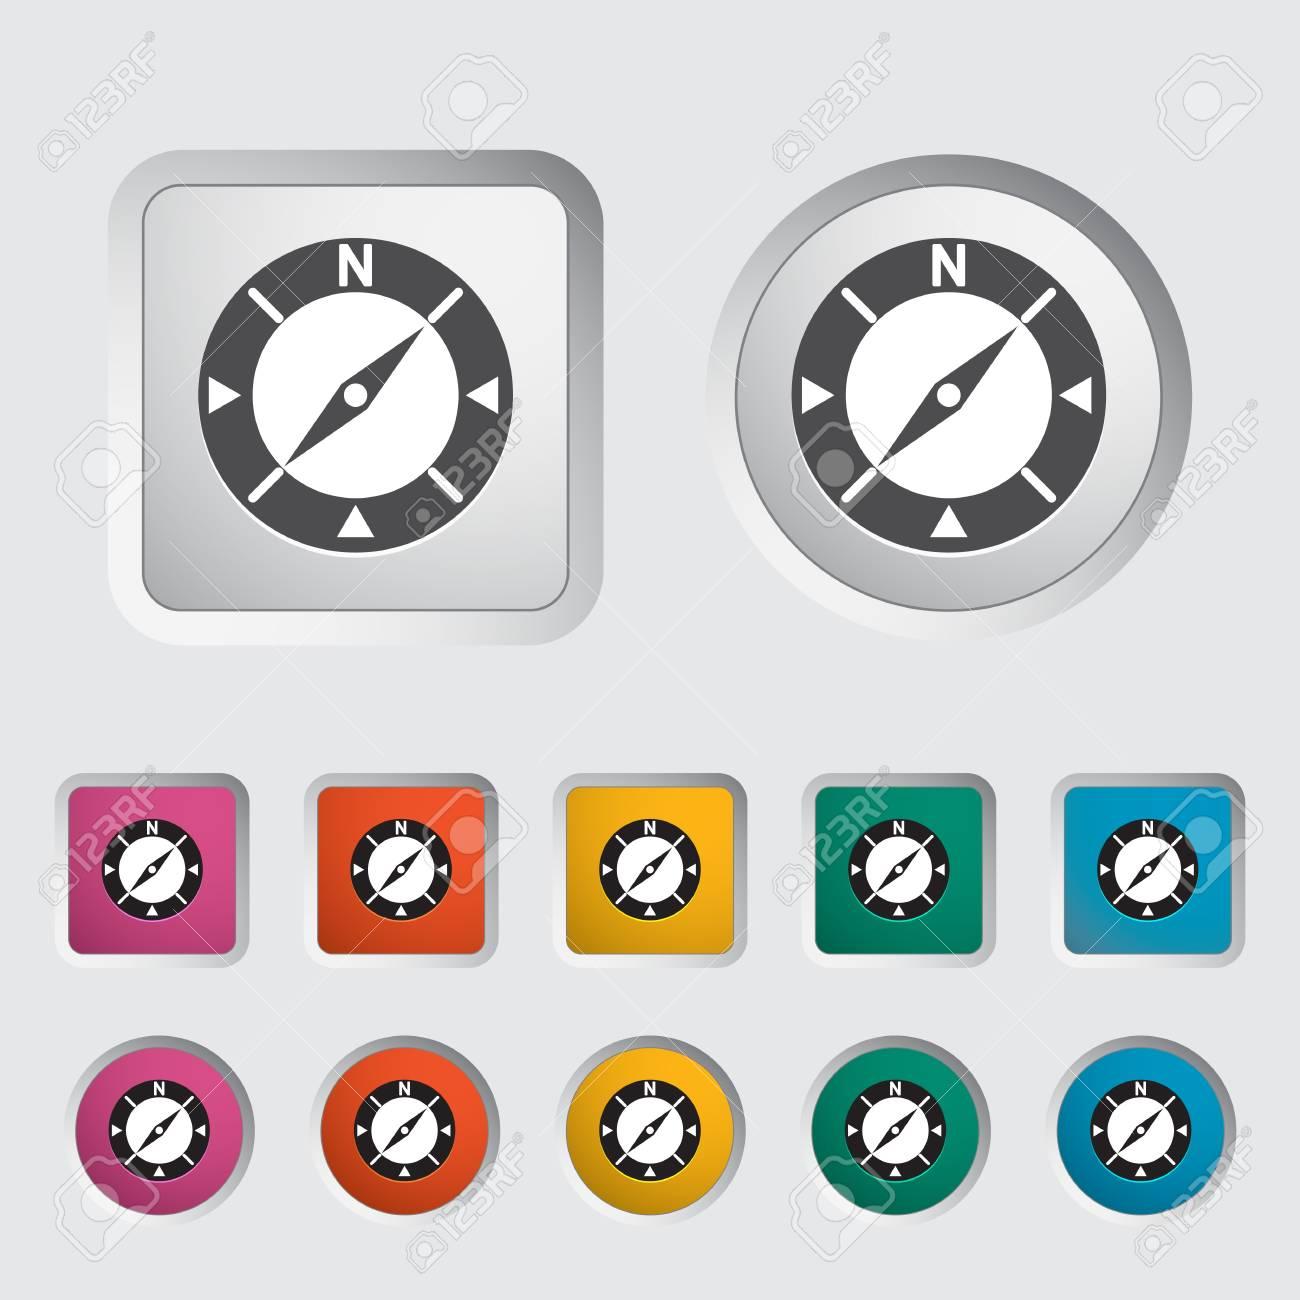 Compass icon  Vector illustration Stock Vector - 16786710